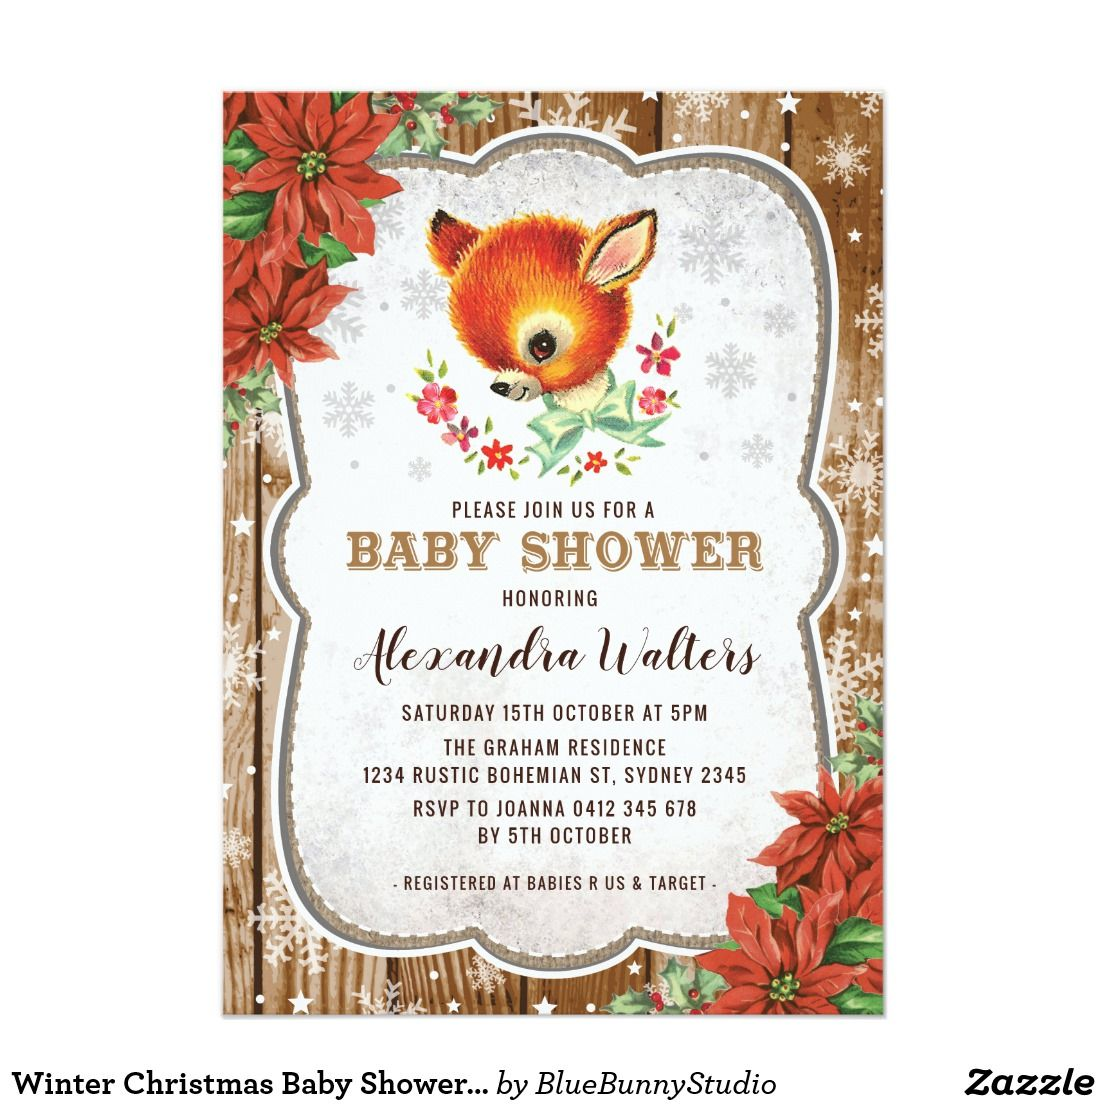 Winter Christmas Baby Shower Invitation Reindeer | baby shower ...